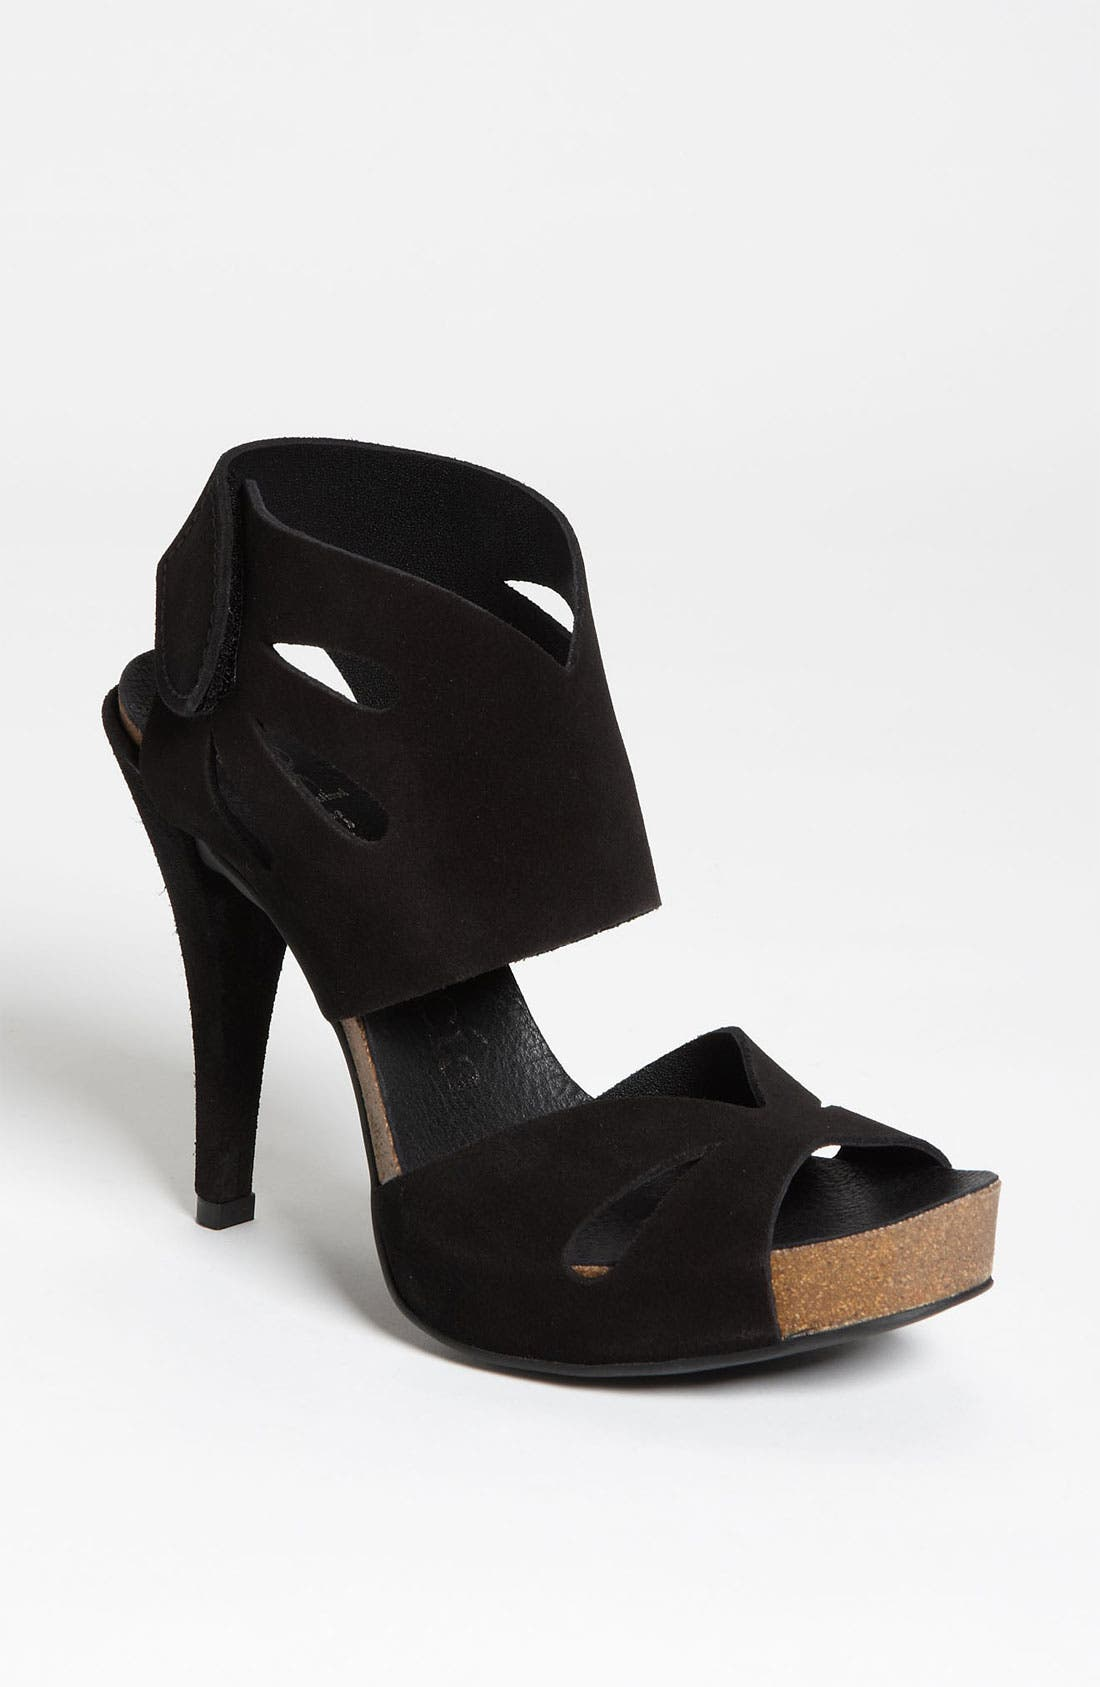 Alternate Image 1 Selected - Pedro Garcia 'Prunella' Sandal